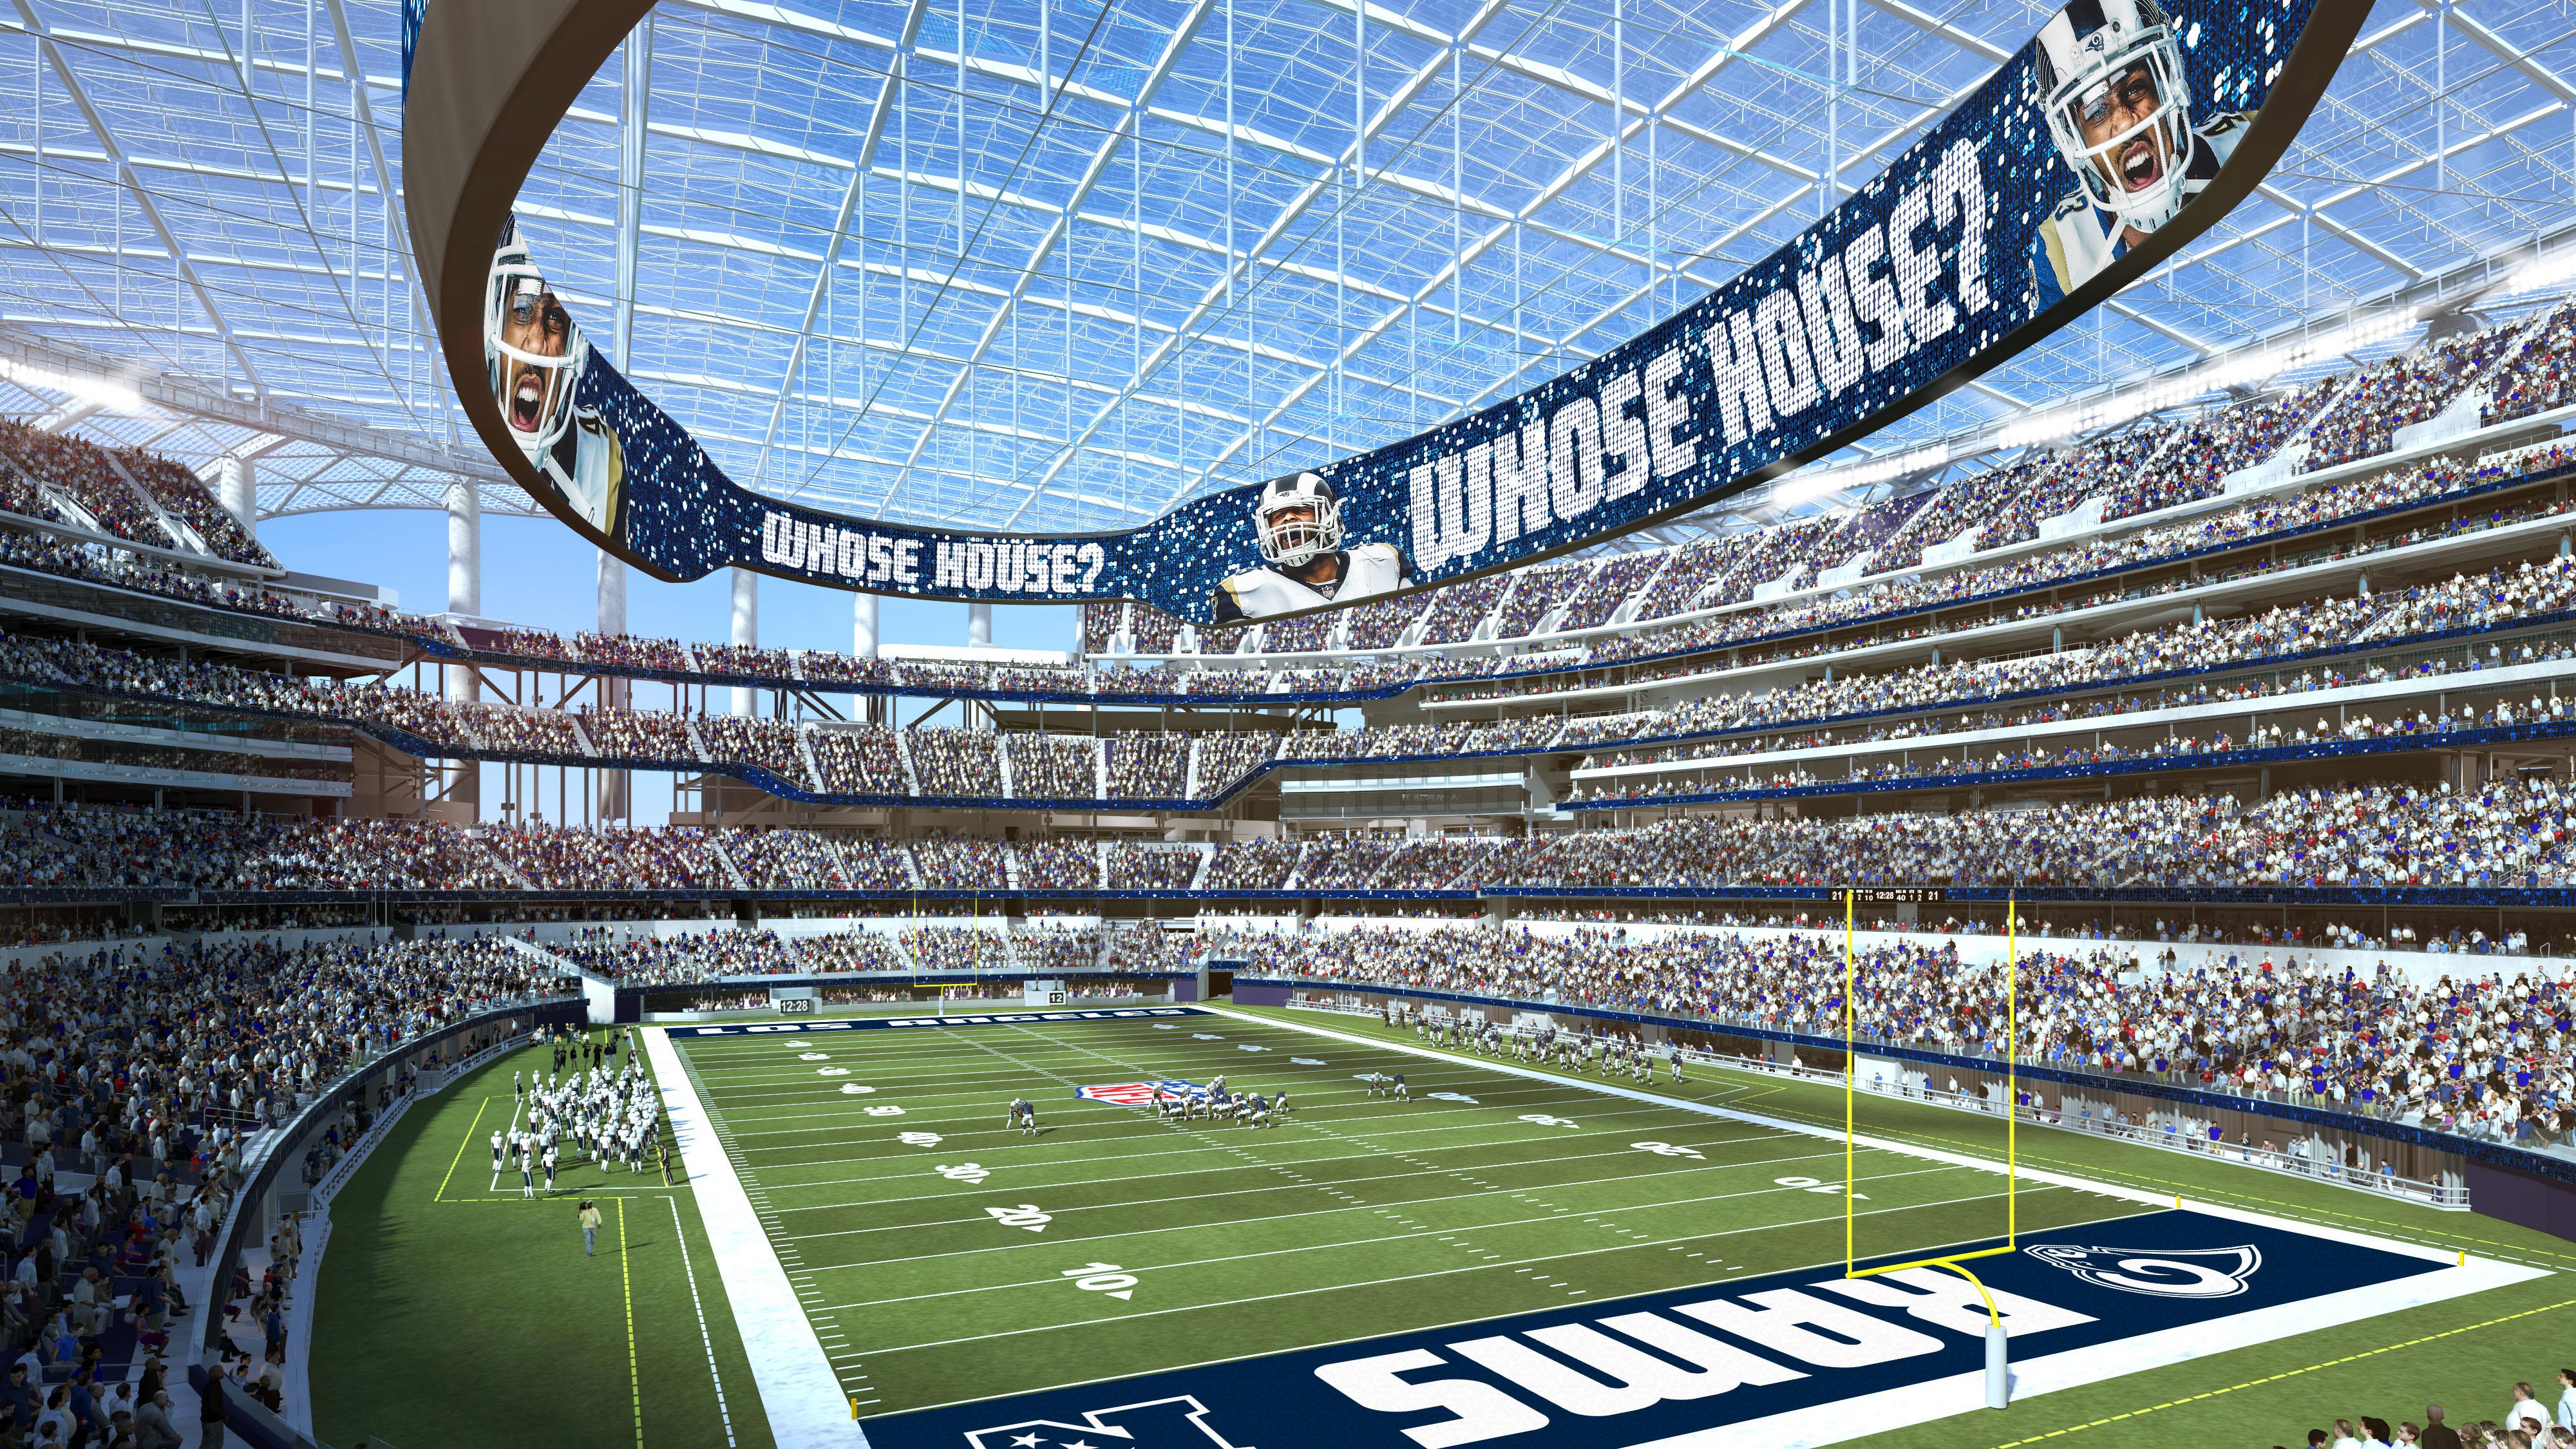 New La Stadium Los Angeles Rams Nfl Football Field Diagram Latest On Entertainment District